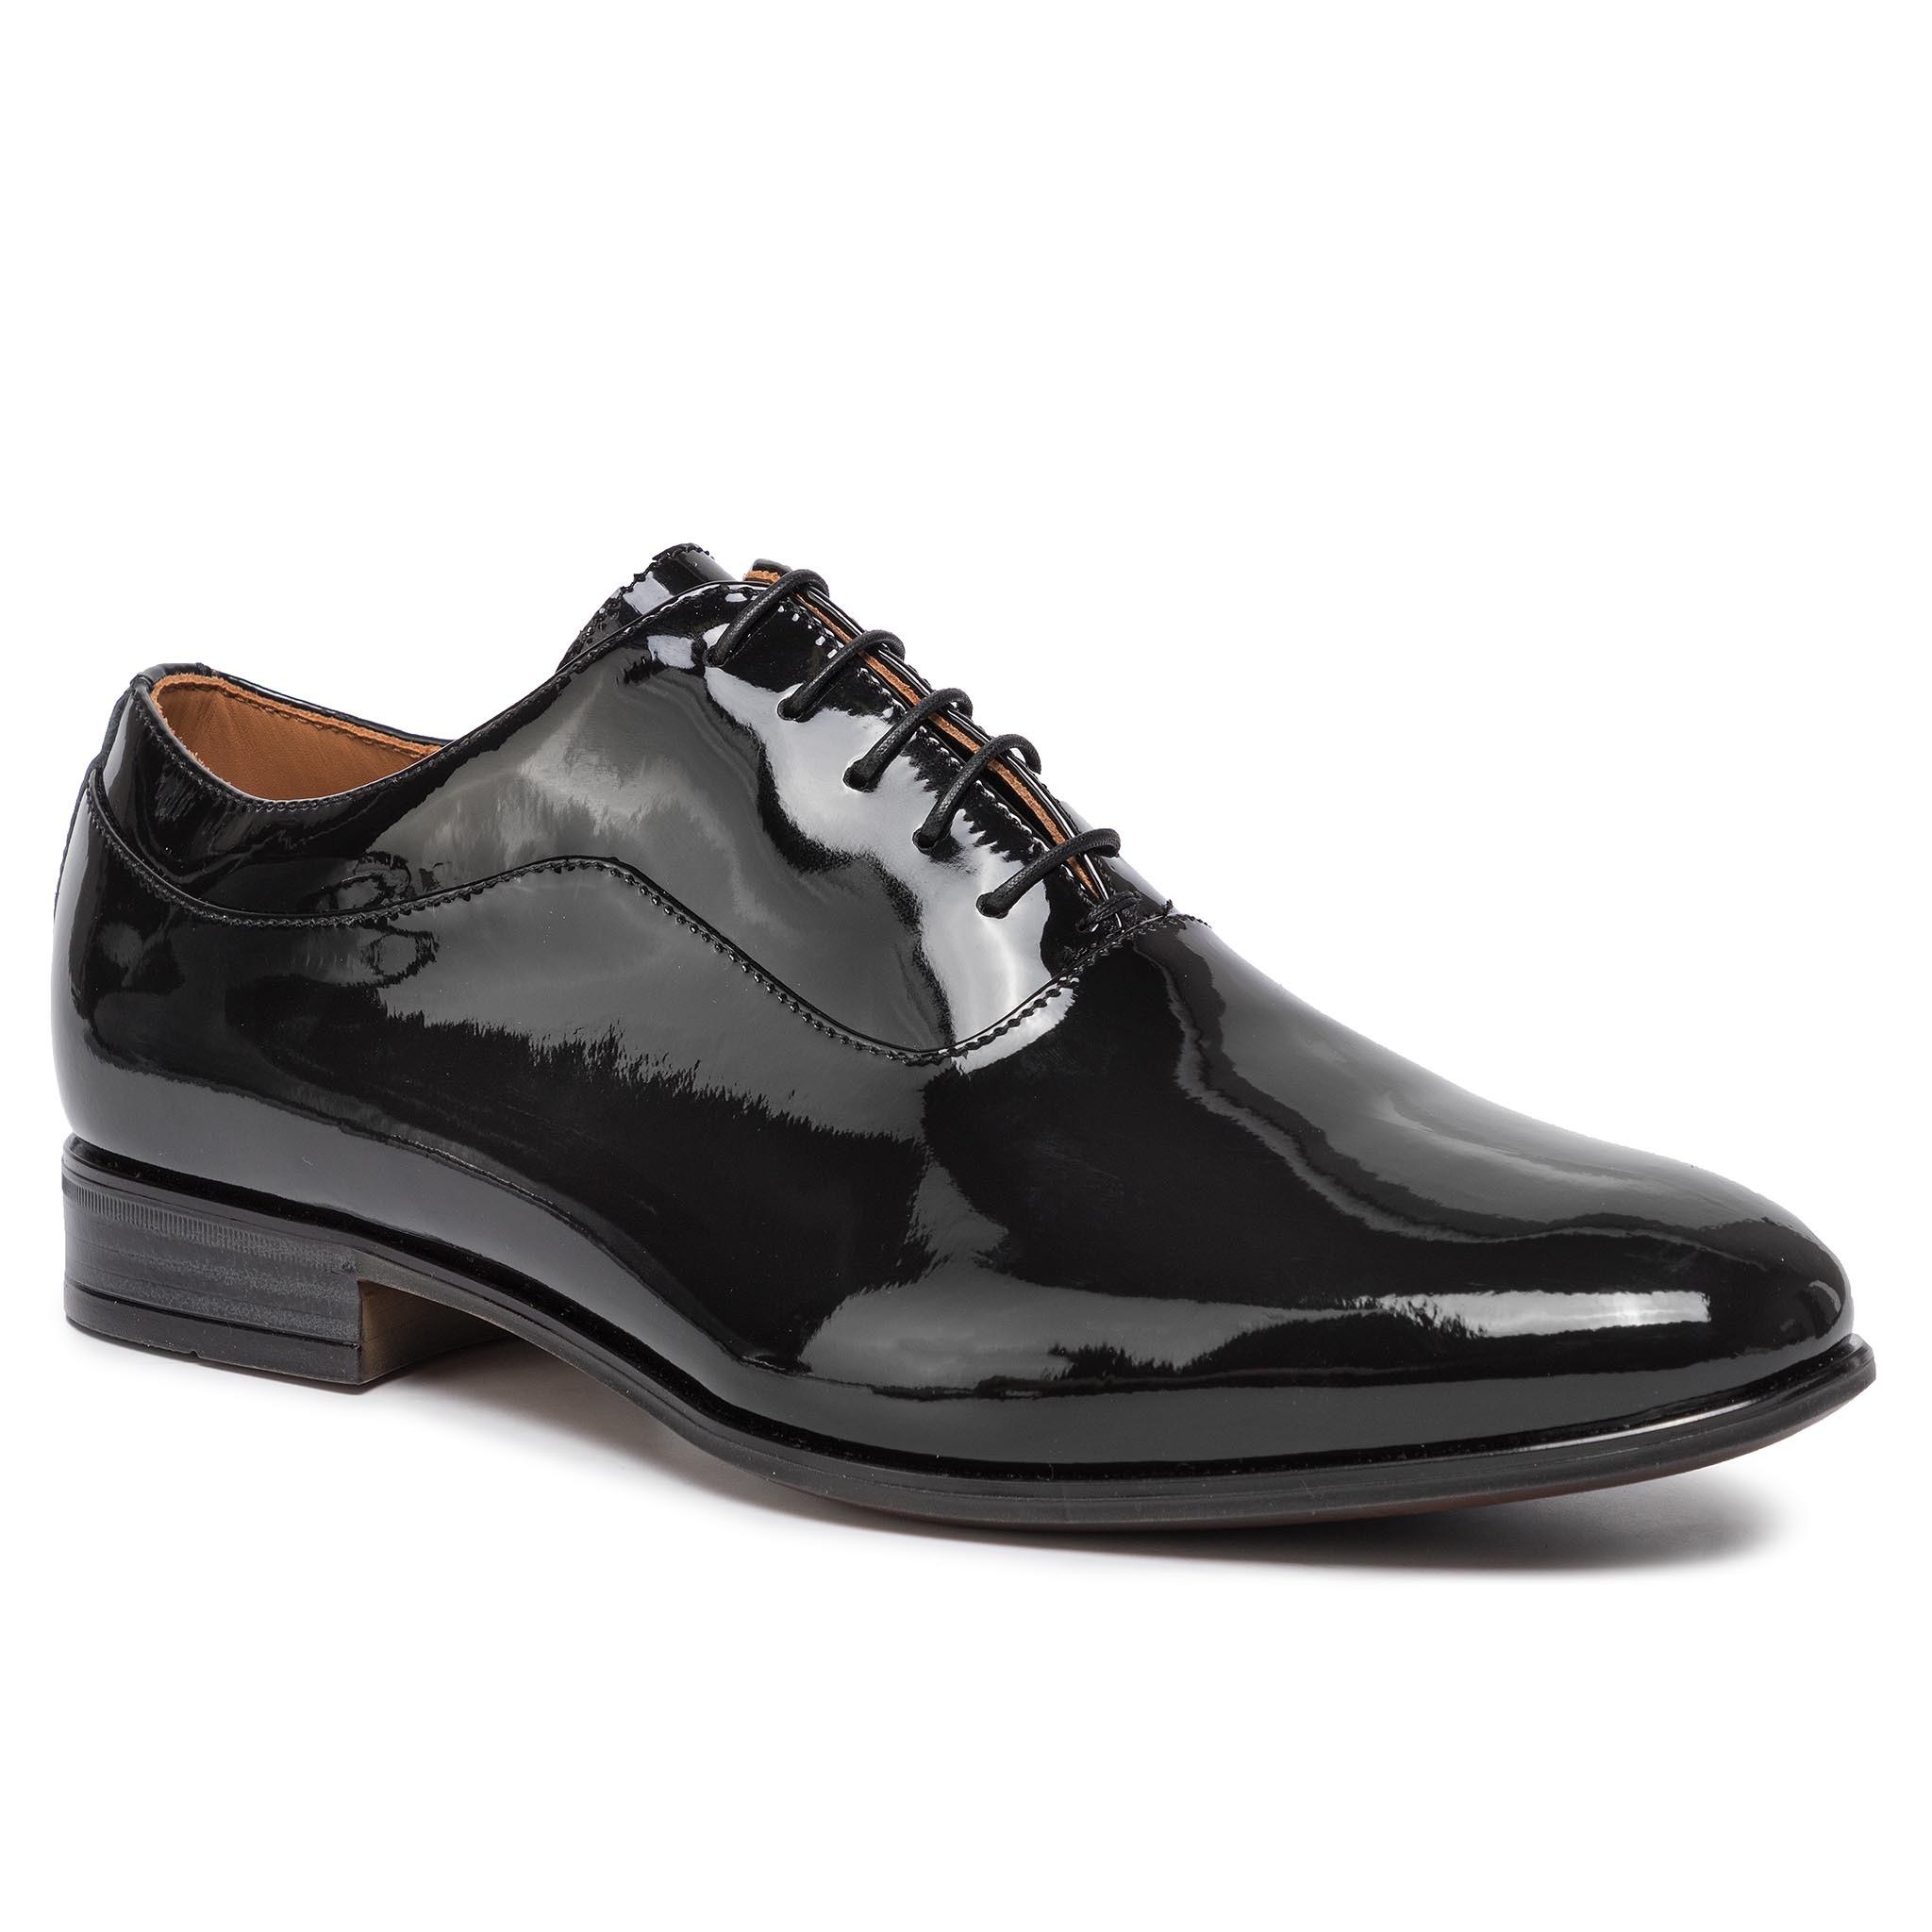 Pantofi GINO ROSSI - Chiasso MPU443-688-0600-9900-0 99